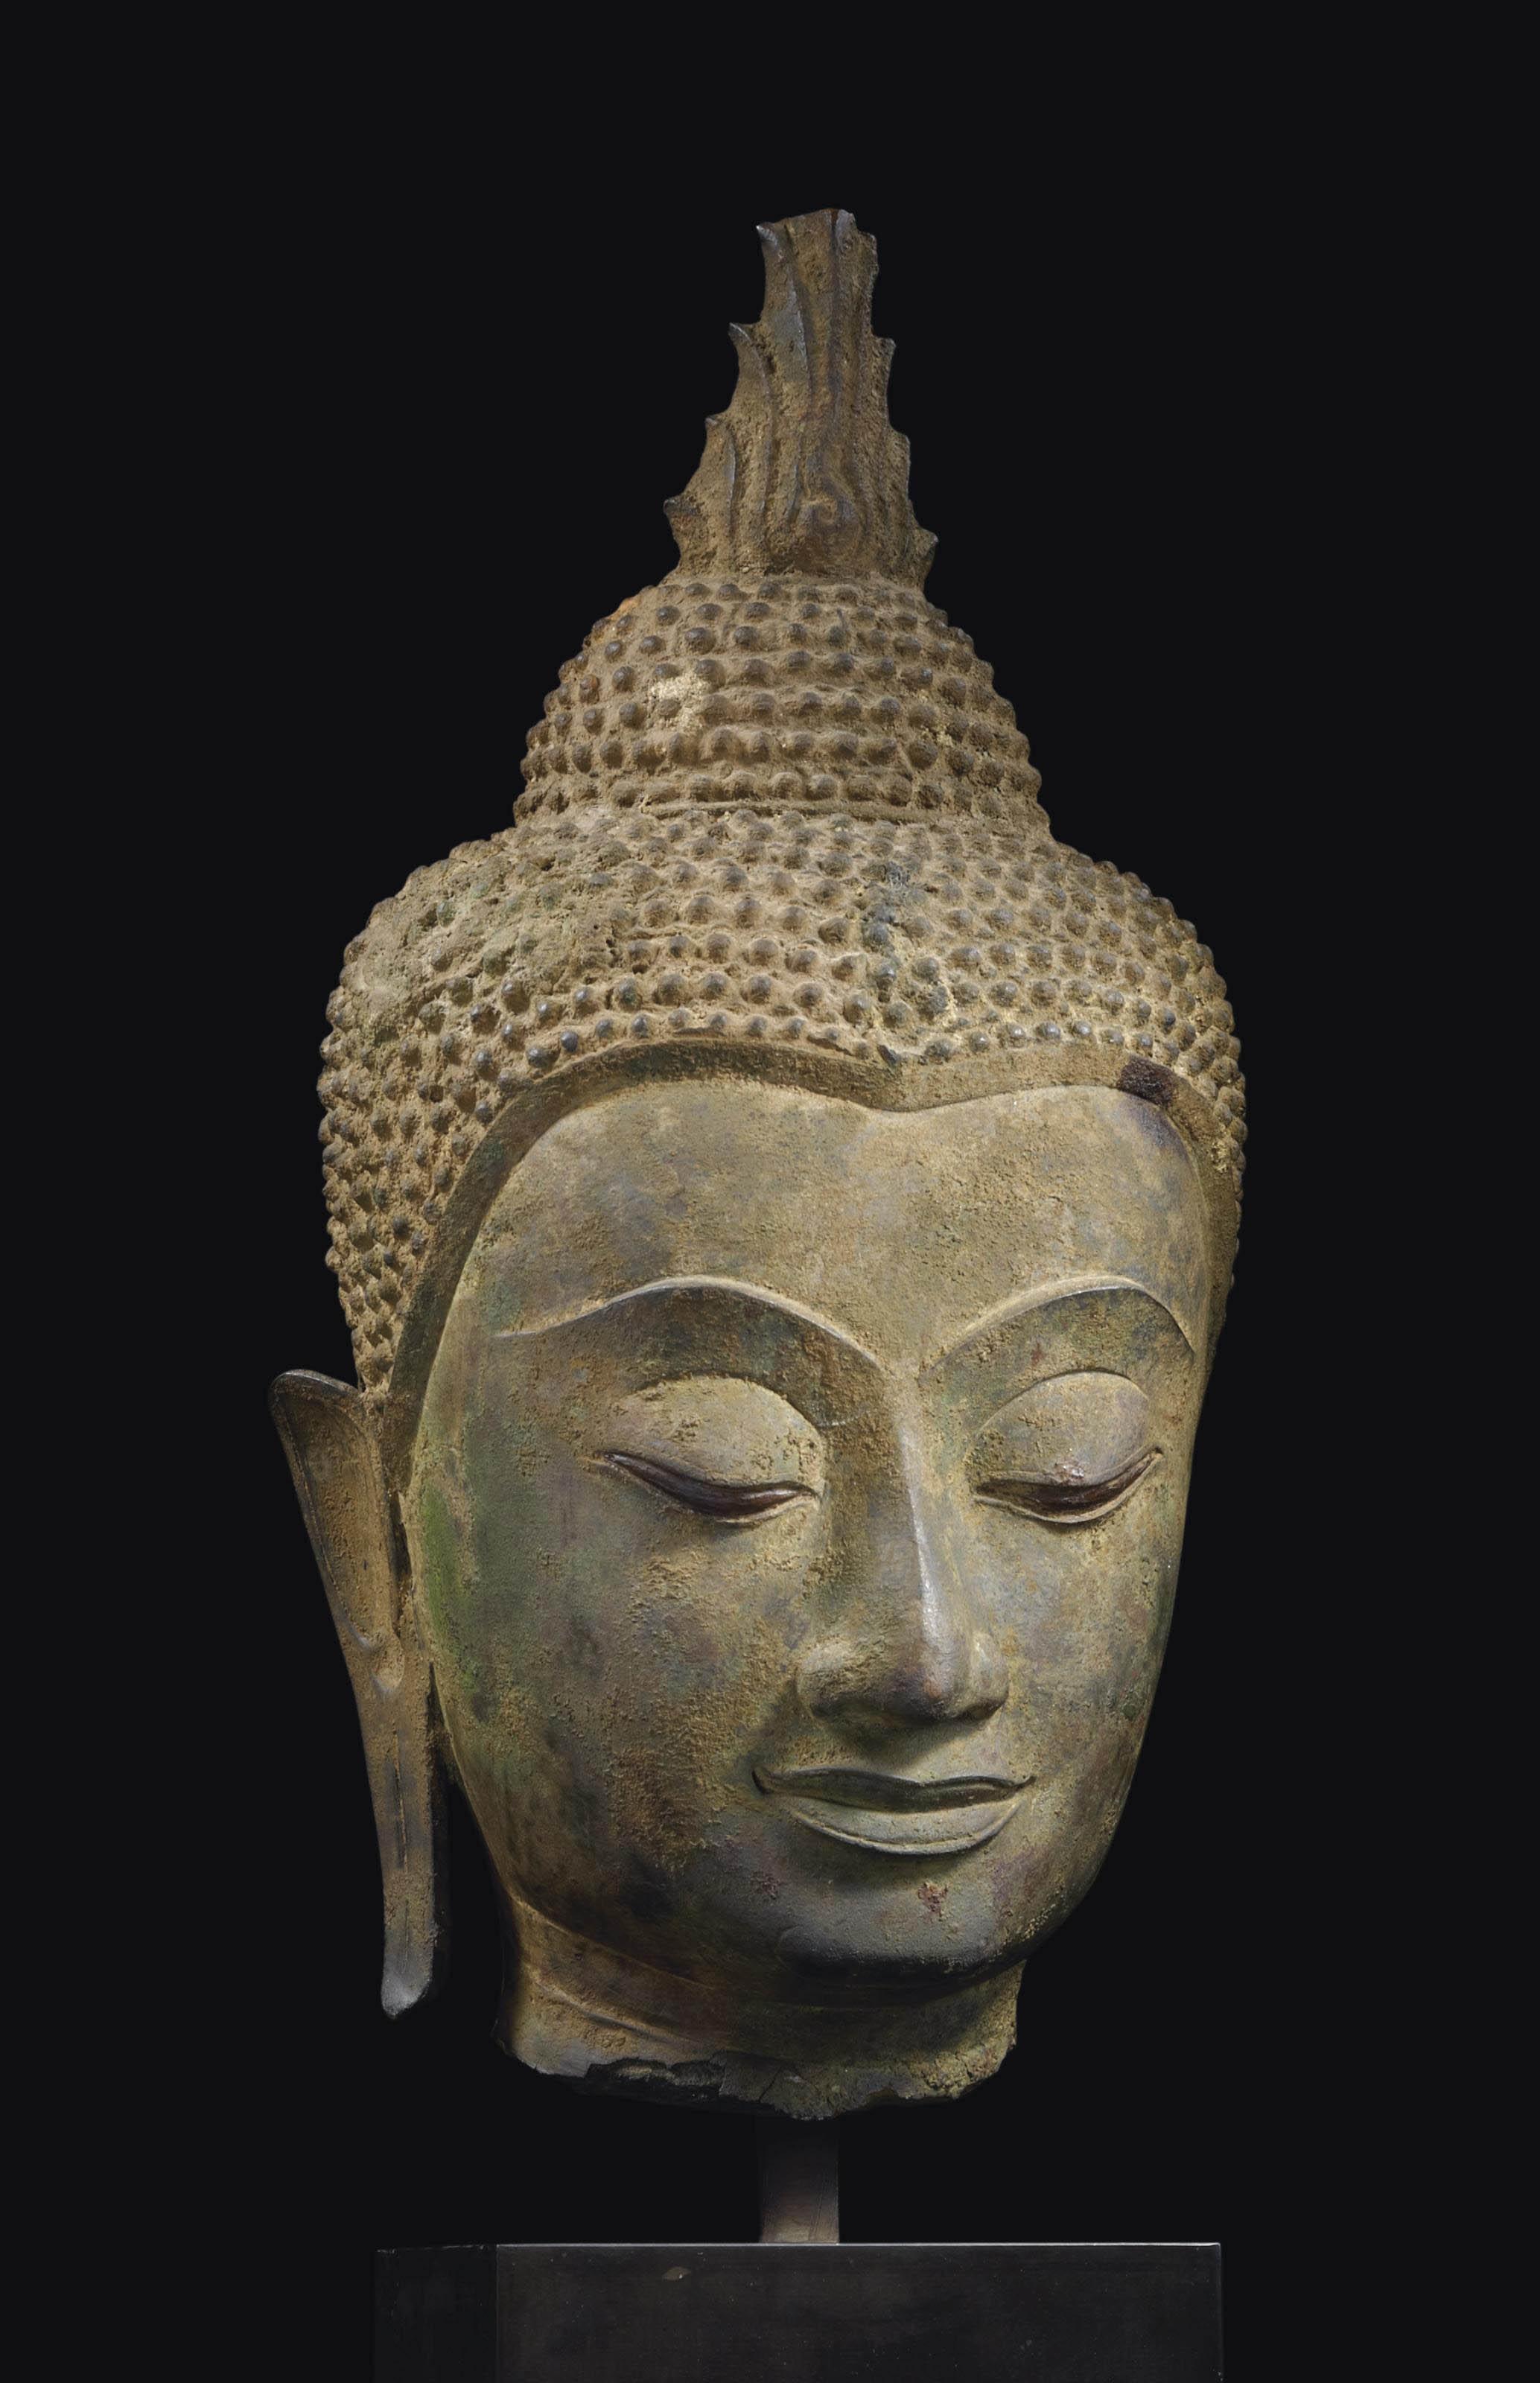 tete de bouddha shakyamuni en bronze thailande style d 39 ayutthaya xvieme siecle christie 39 s. Black Bedroom Furniture Sets. Home Design Ideas